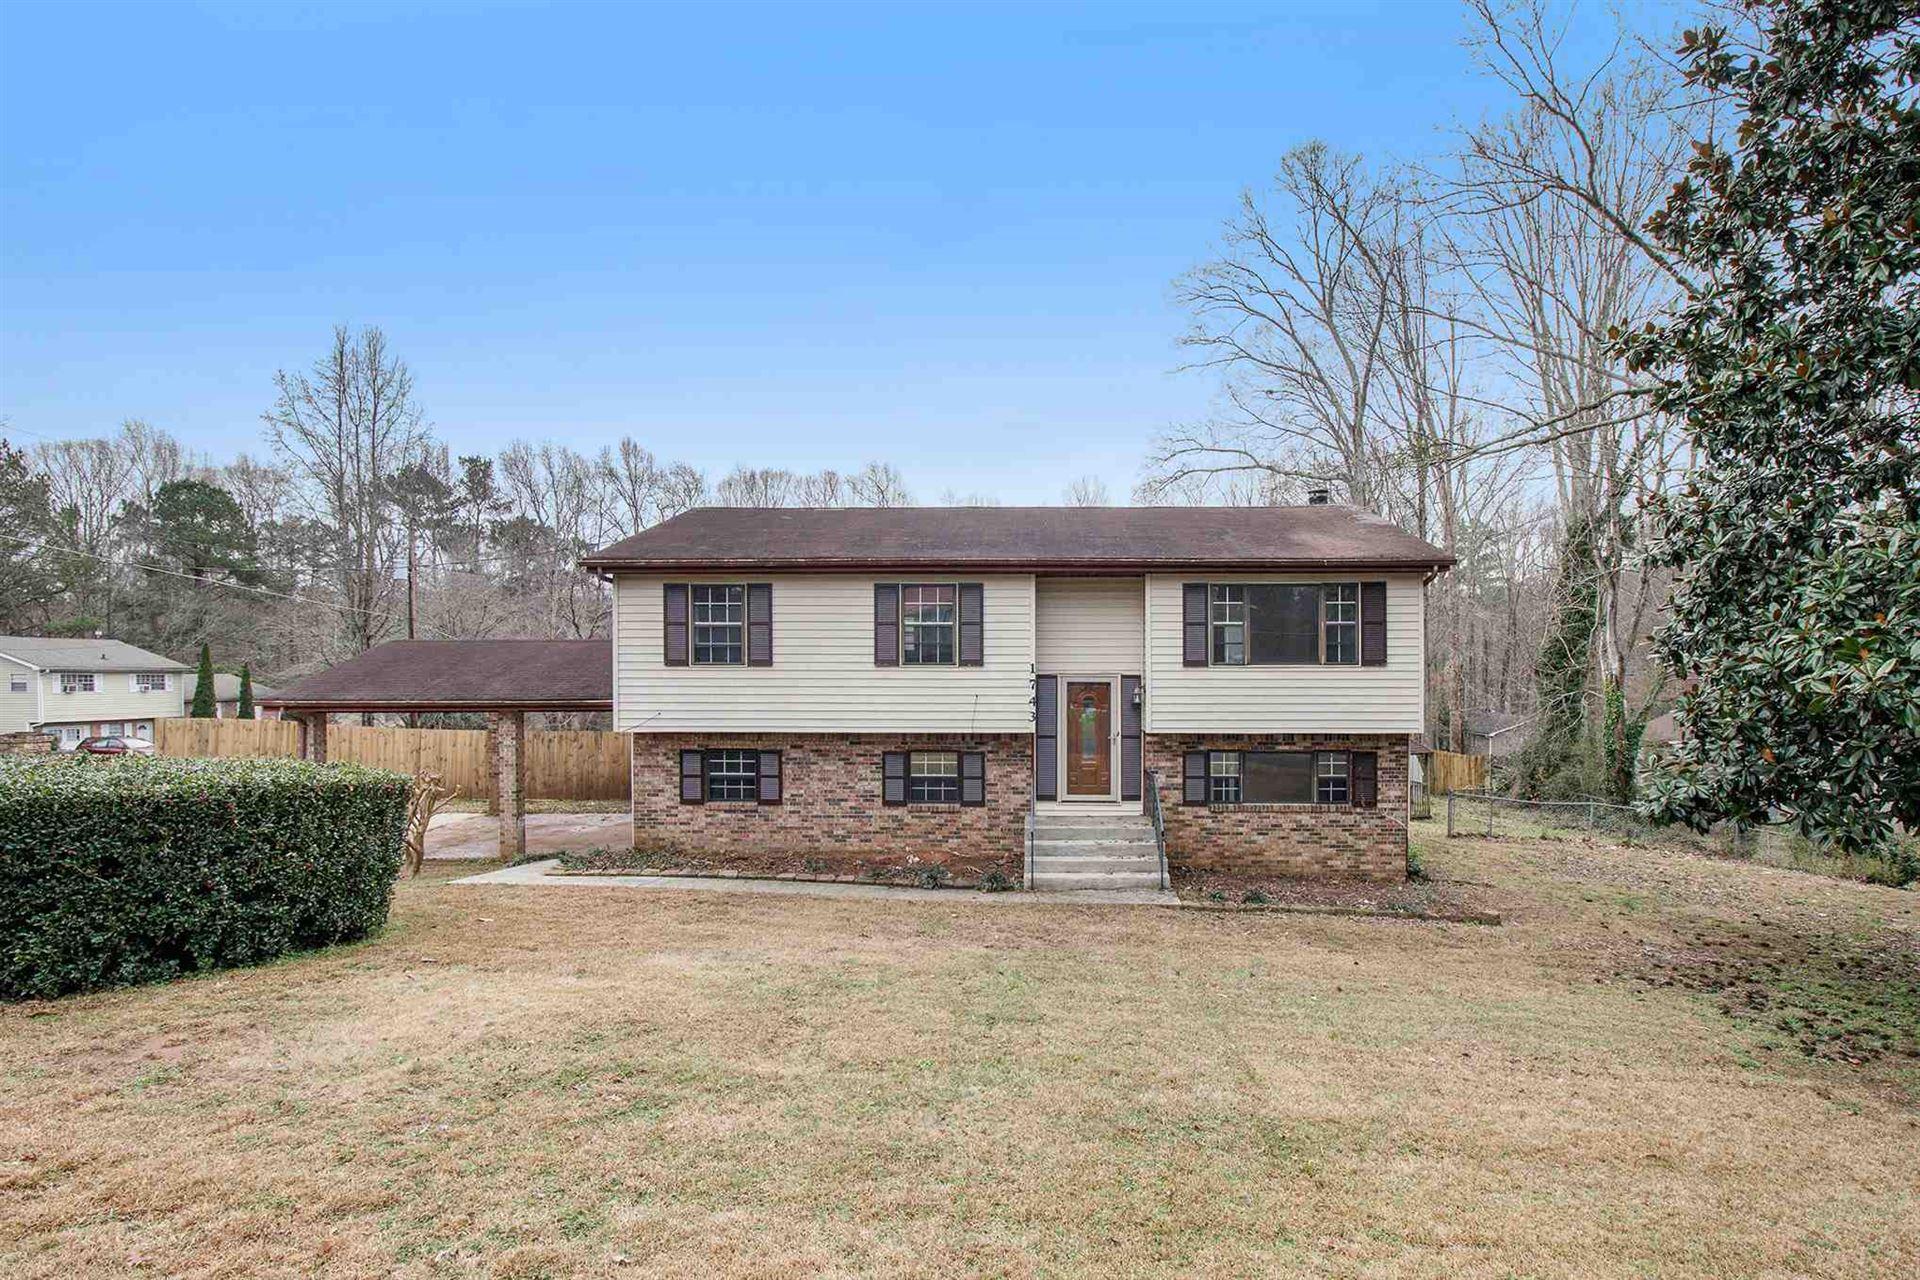 1743 Jarrard, Jonesboro, GA 30236 - MLS#: 8912011